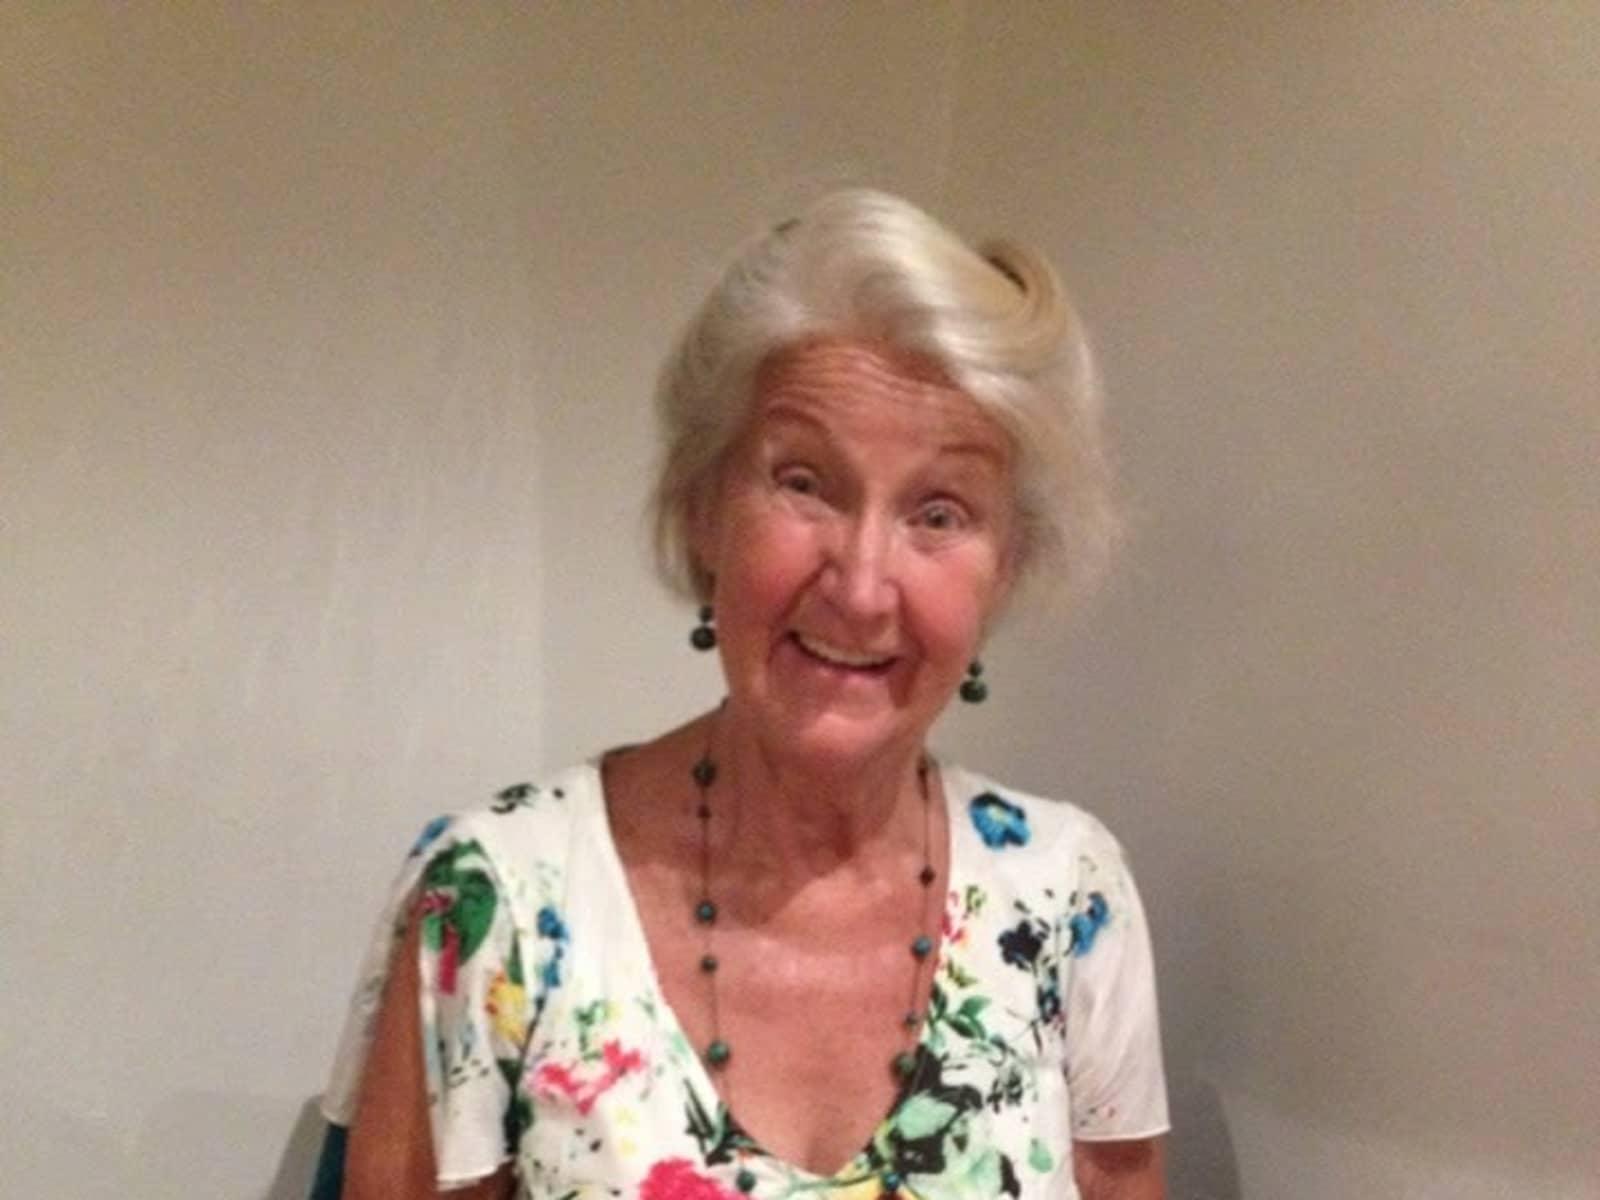 Caroline from Plymouth, United Kingdom